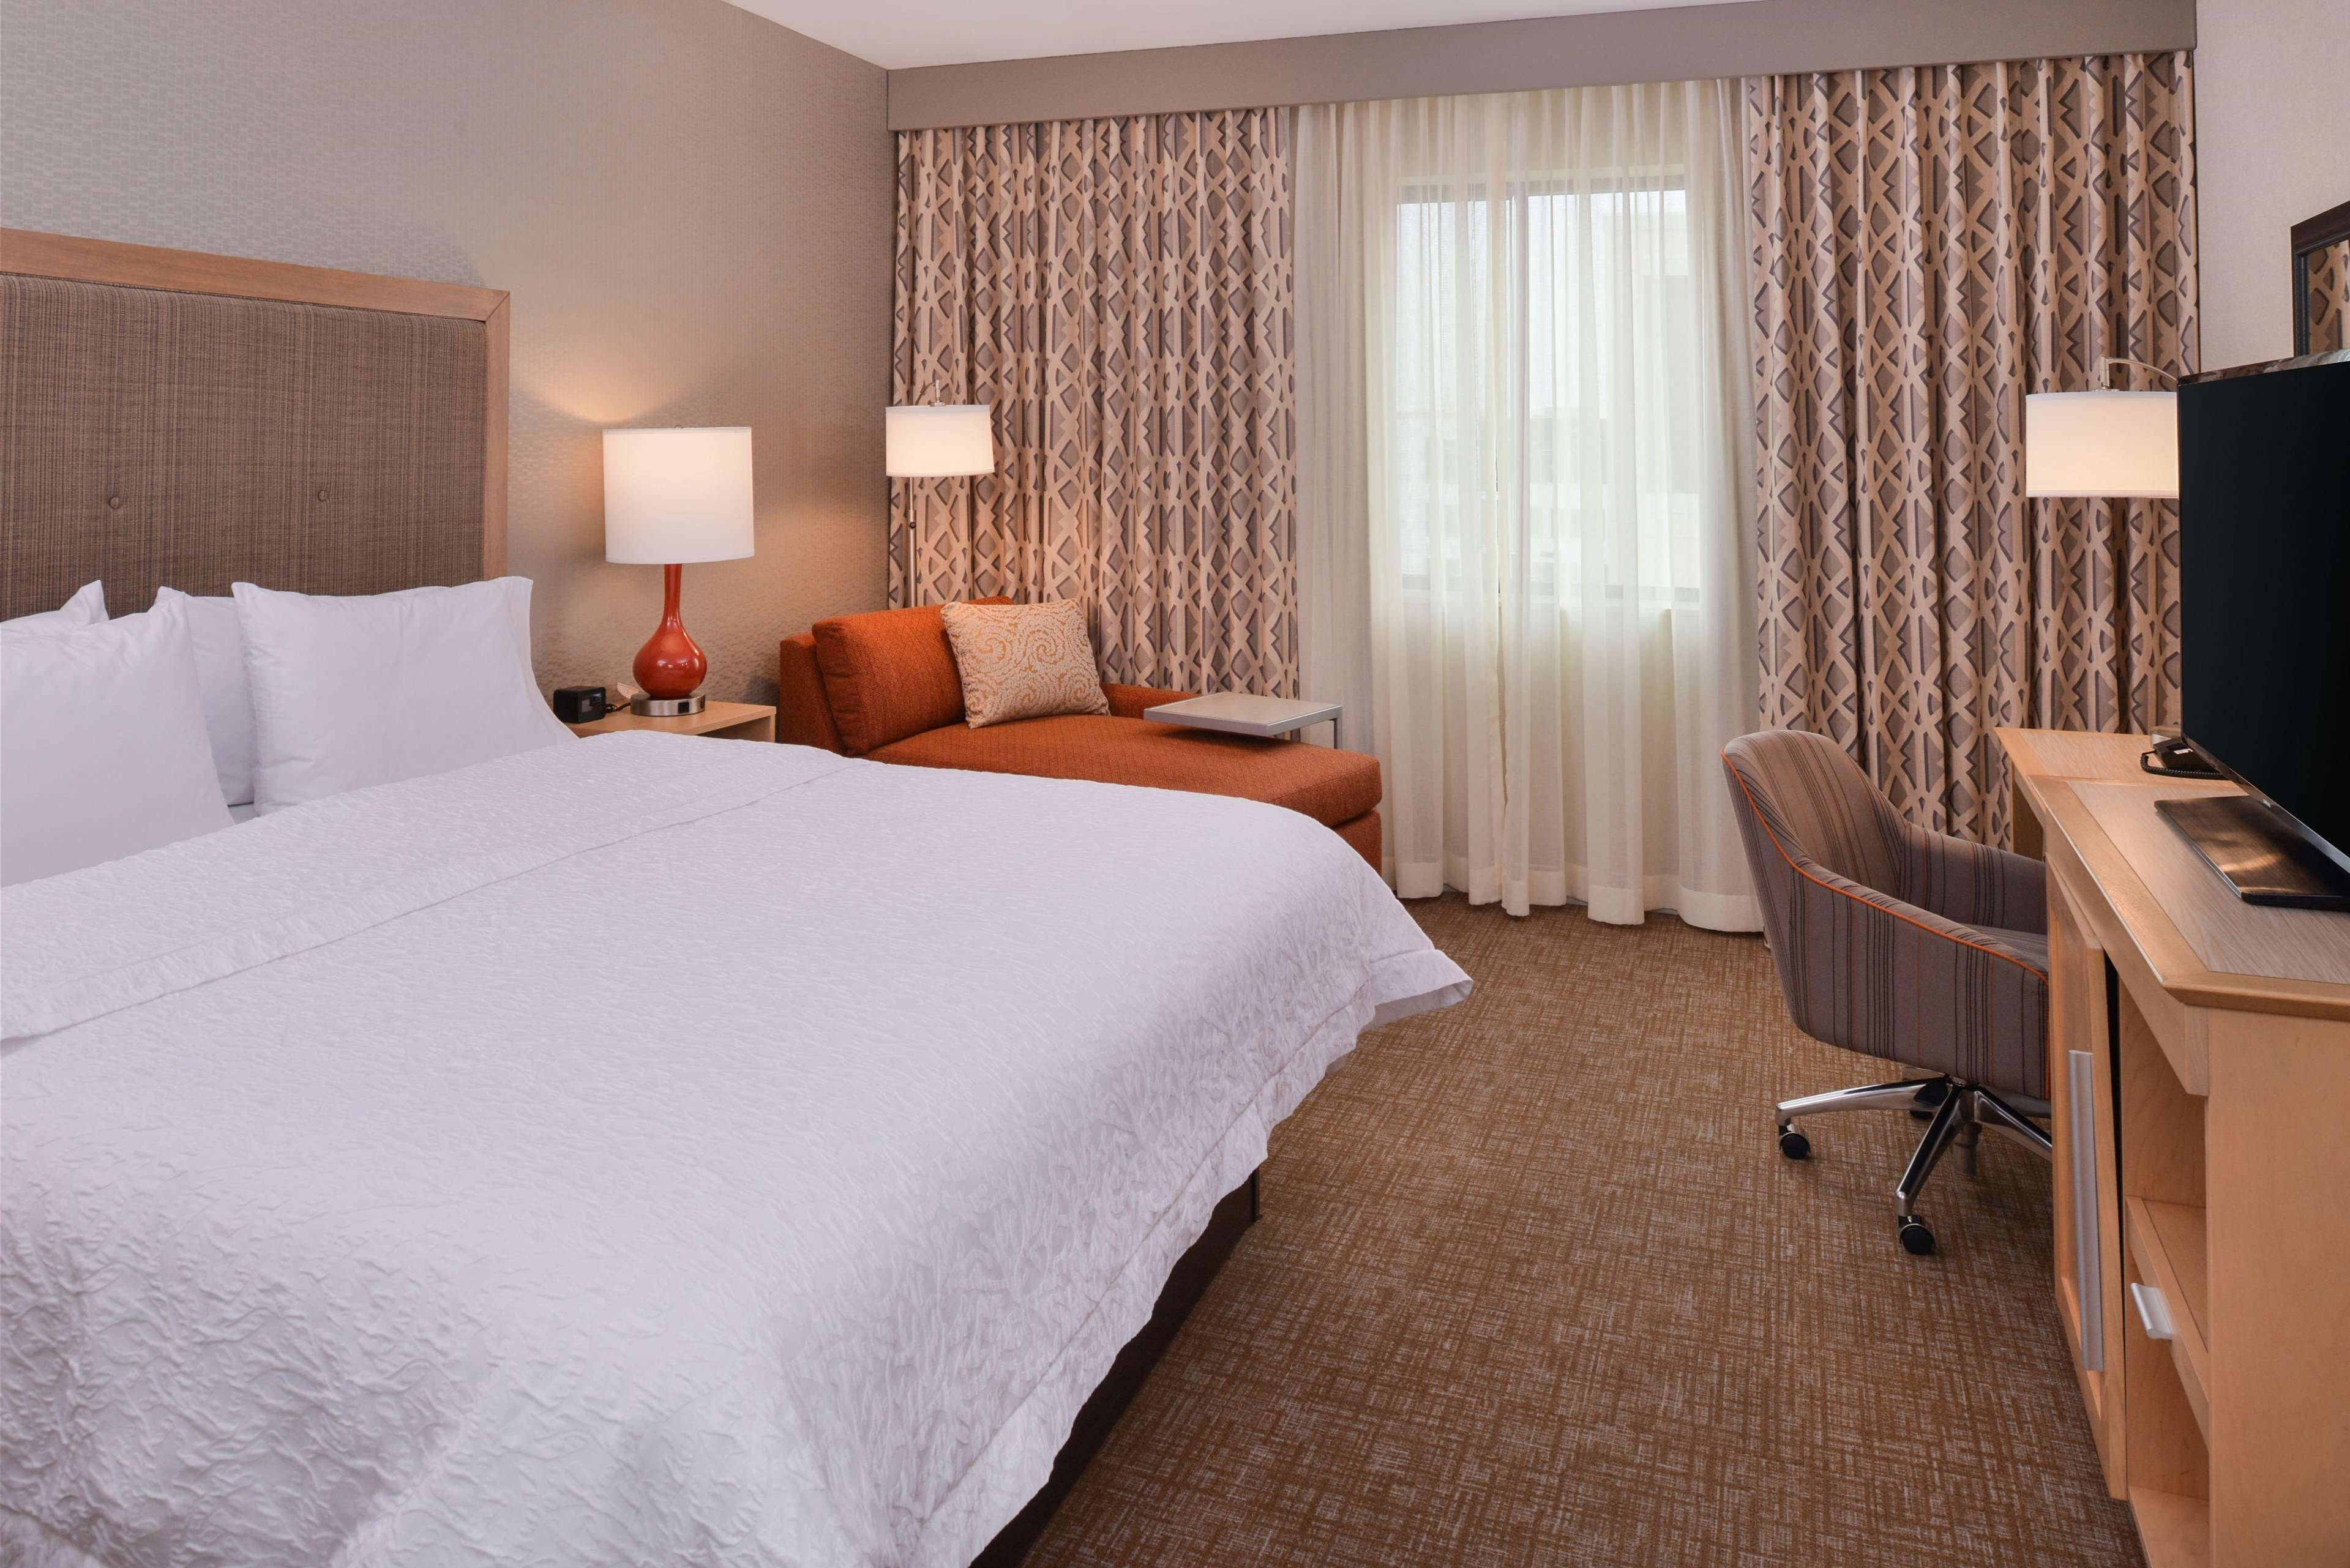 Hampton Inn & Suites Denver-Speer Boulevard image 16